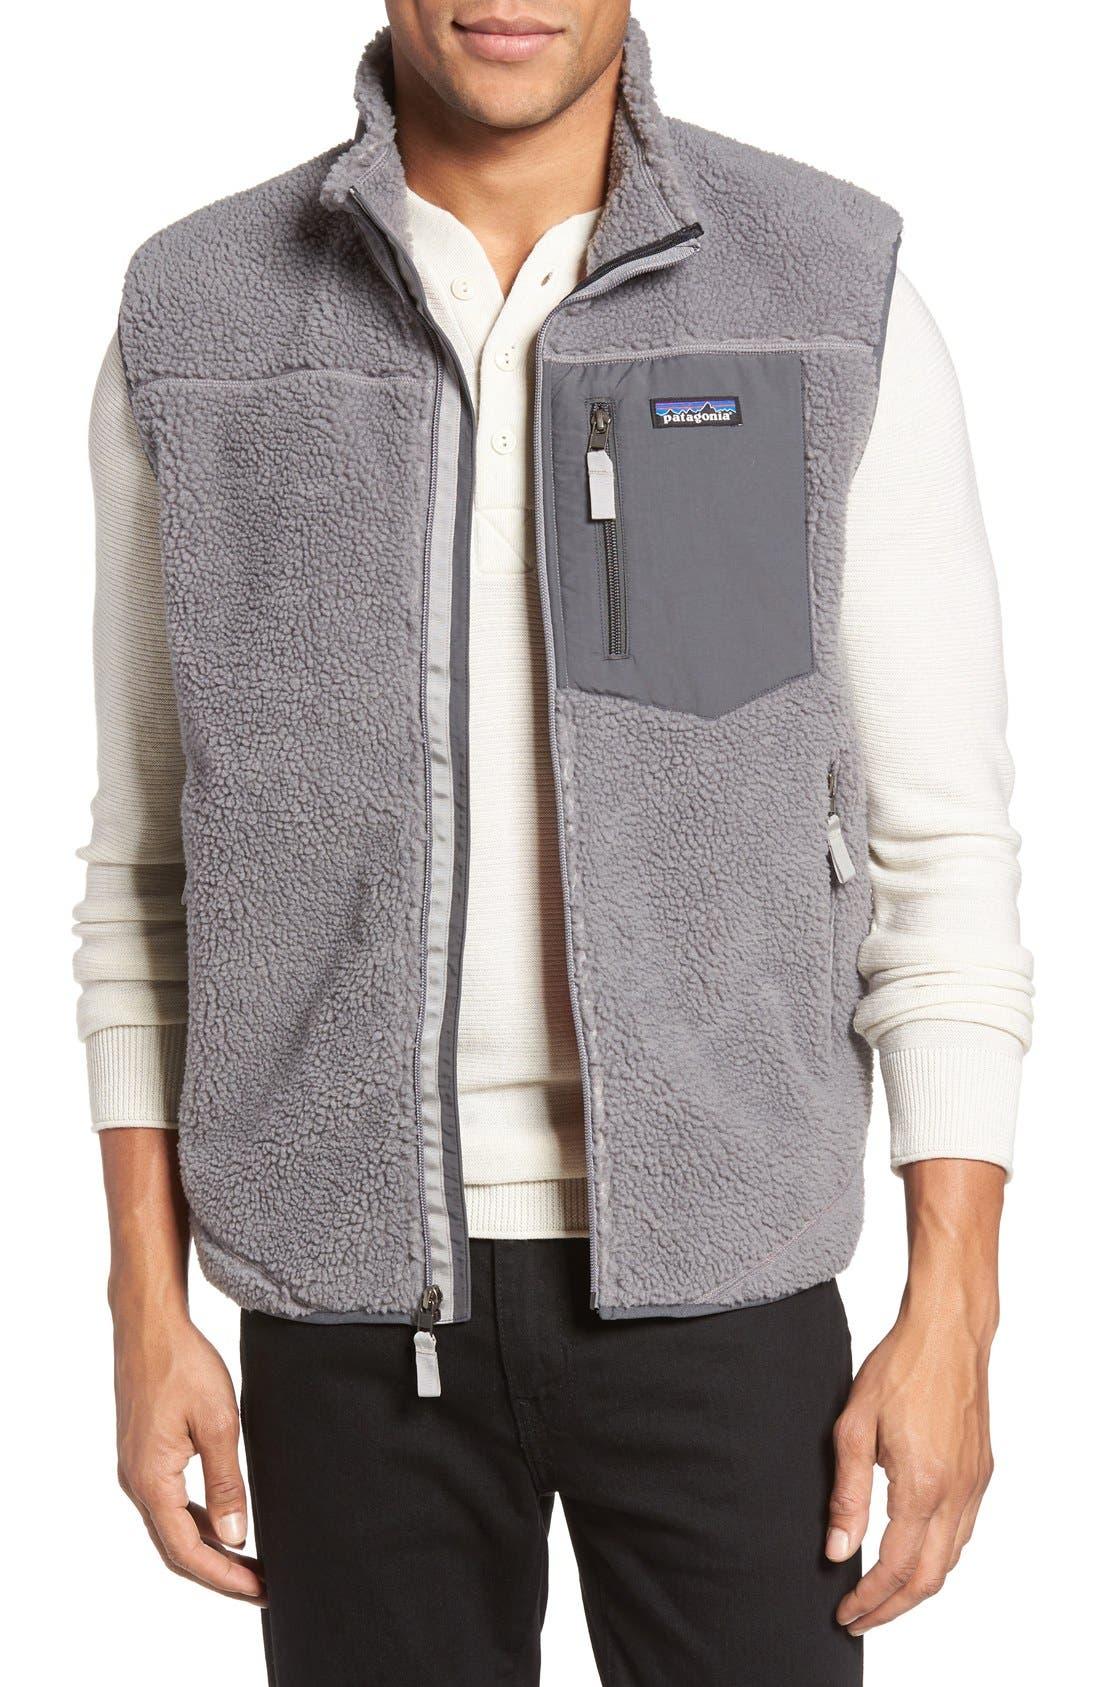 Patagonia Classic Retro-X® Waterproof Vest